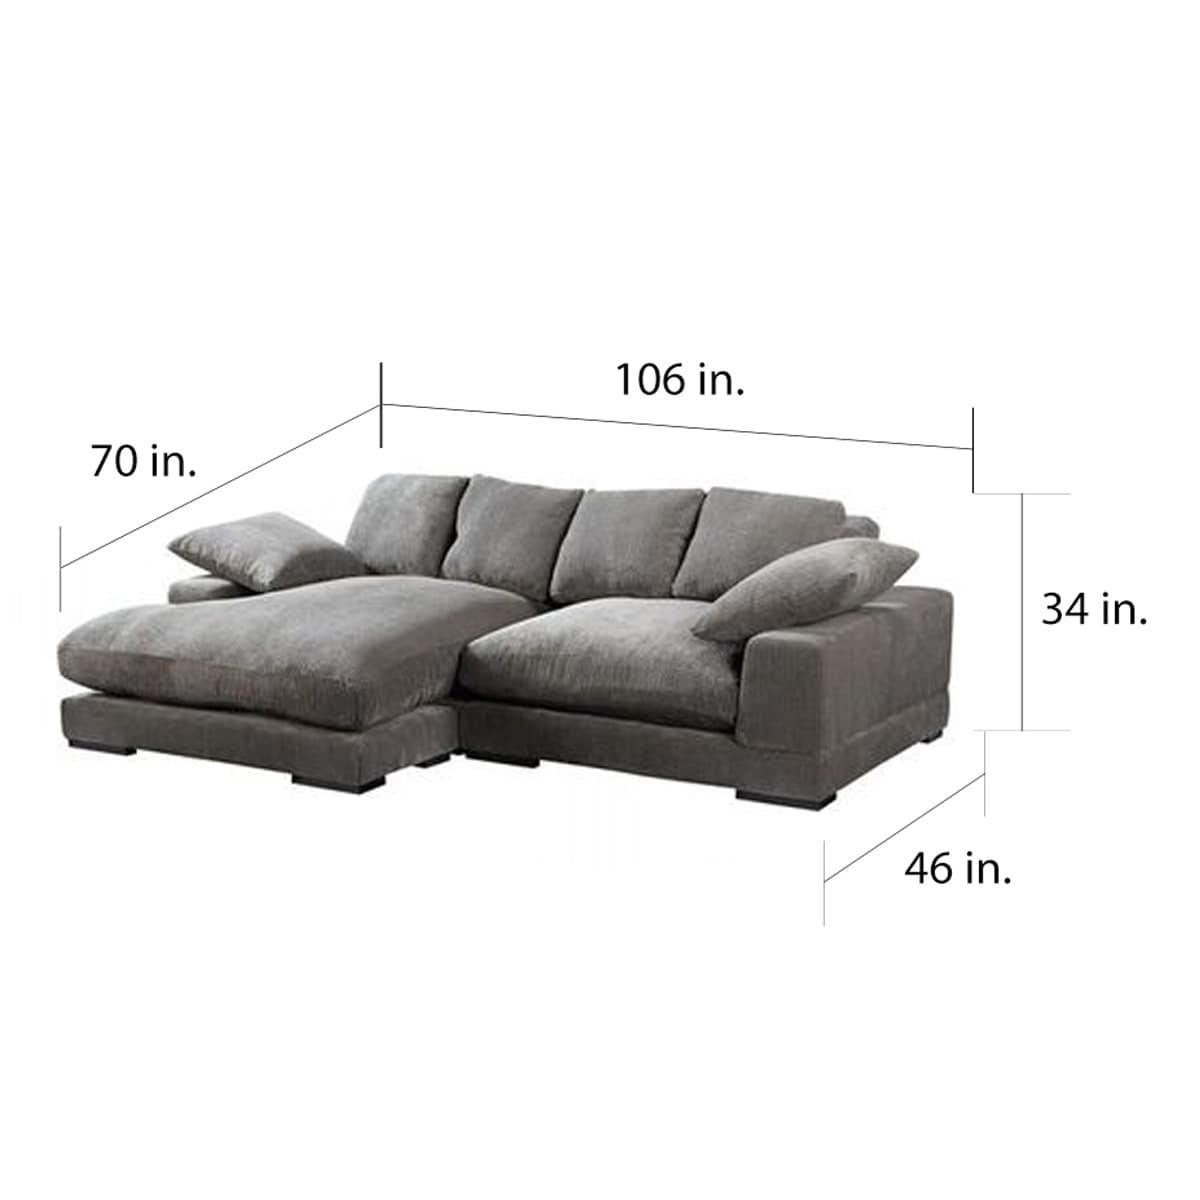 Peachy Aurelle Home Reversible Deep Seat Contemporary Sectional Sofa Theyellowbook Wood Chair Design Ideas Theyellowbookinfo